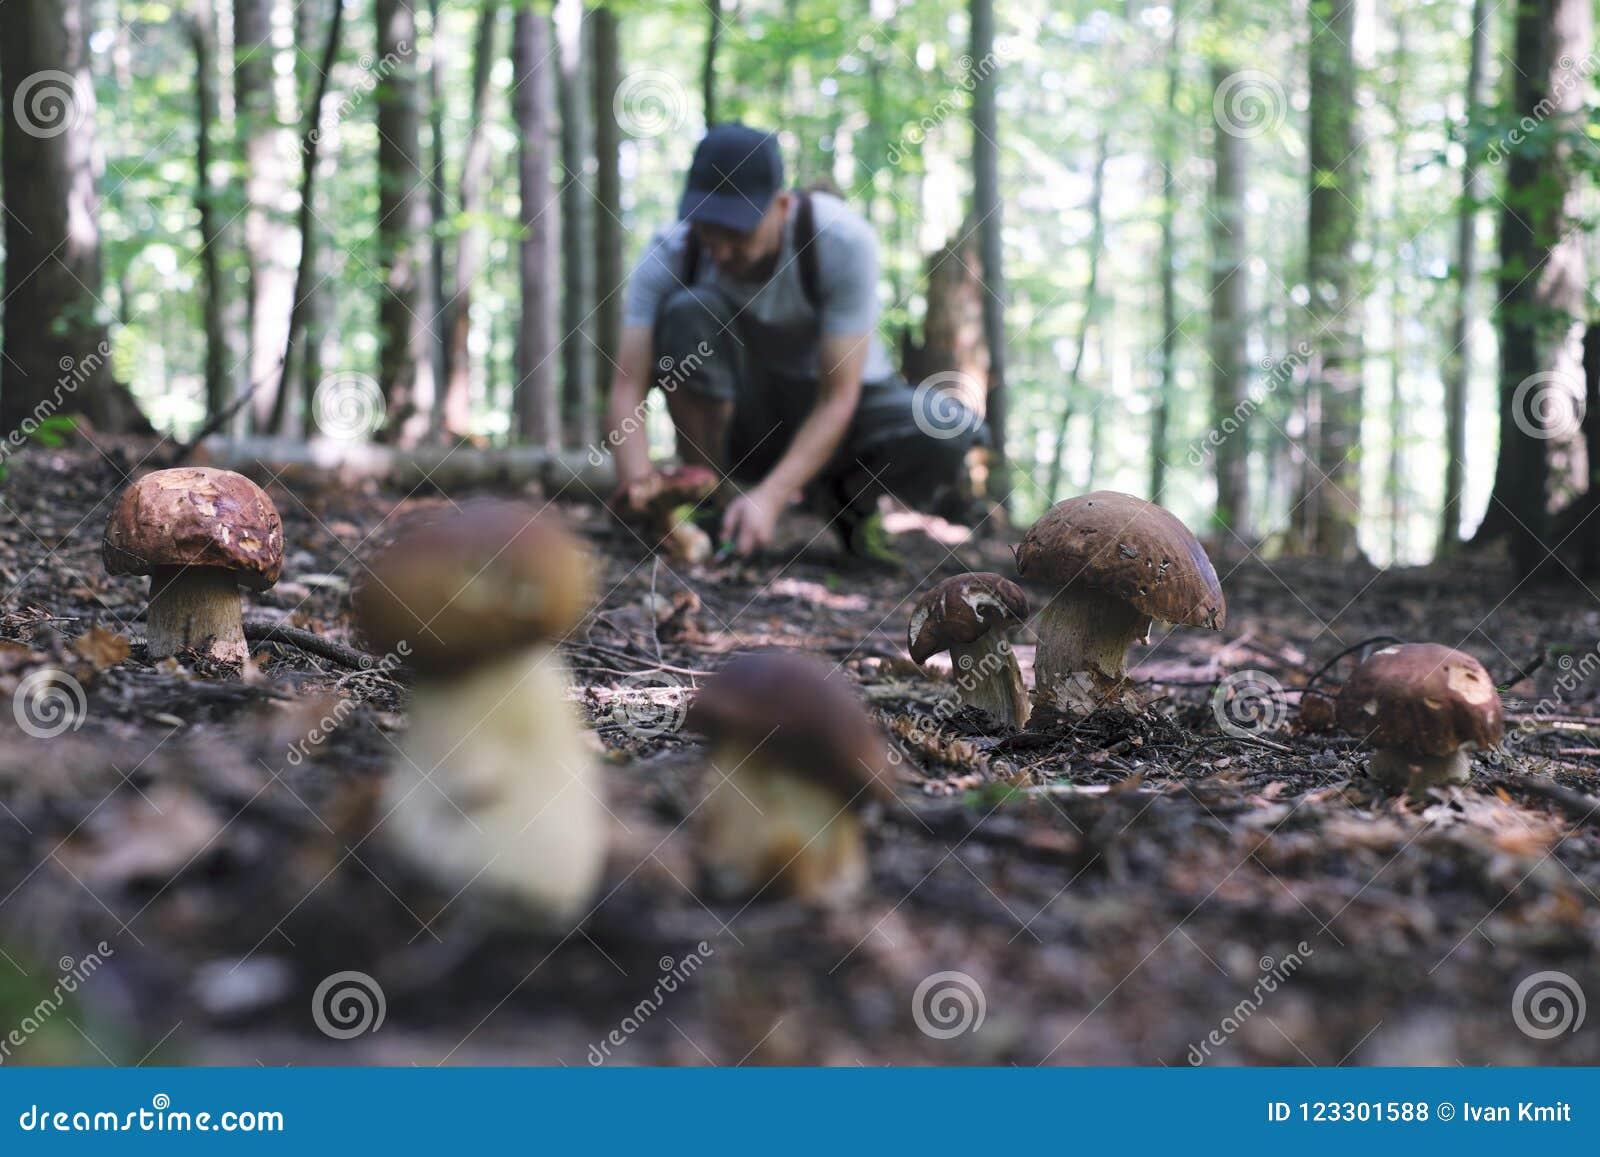 Man collect mushrooms